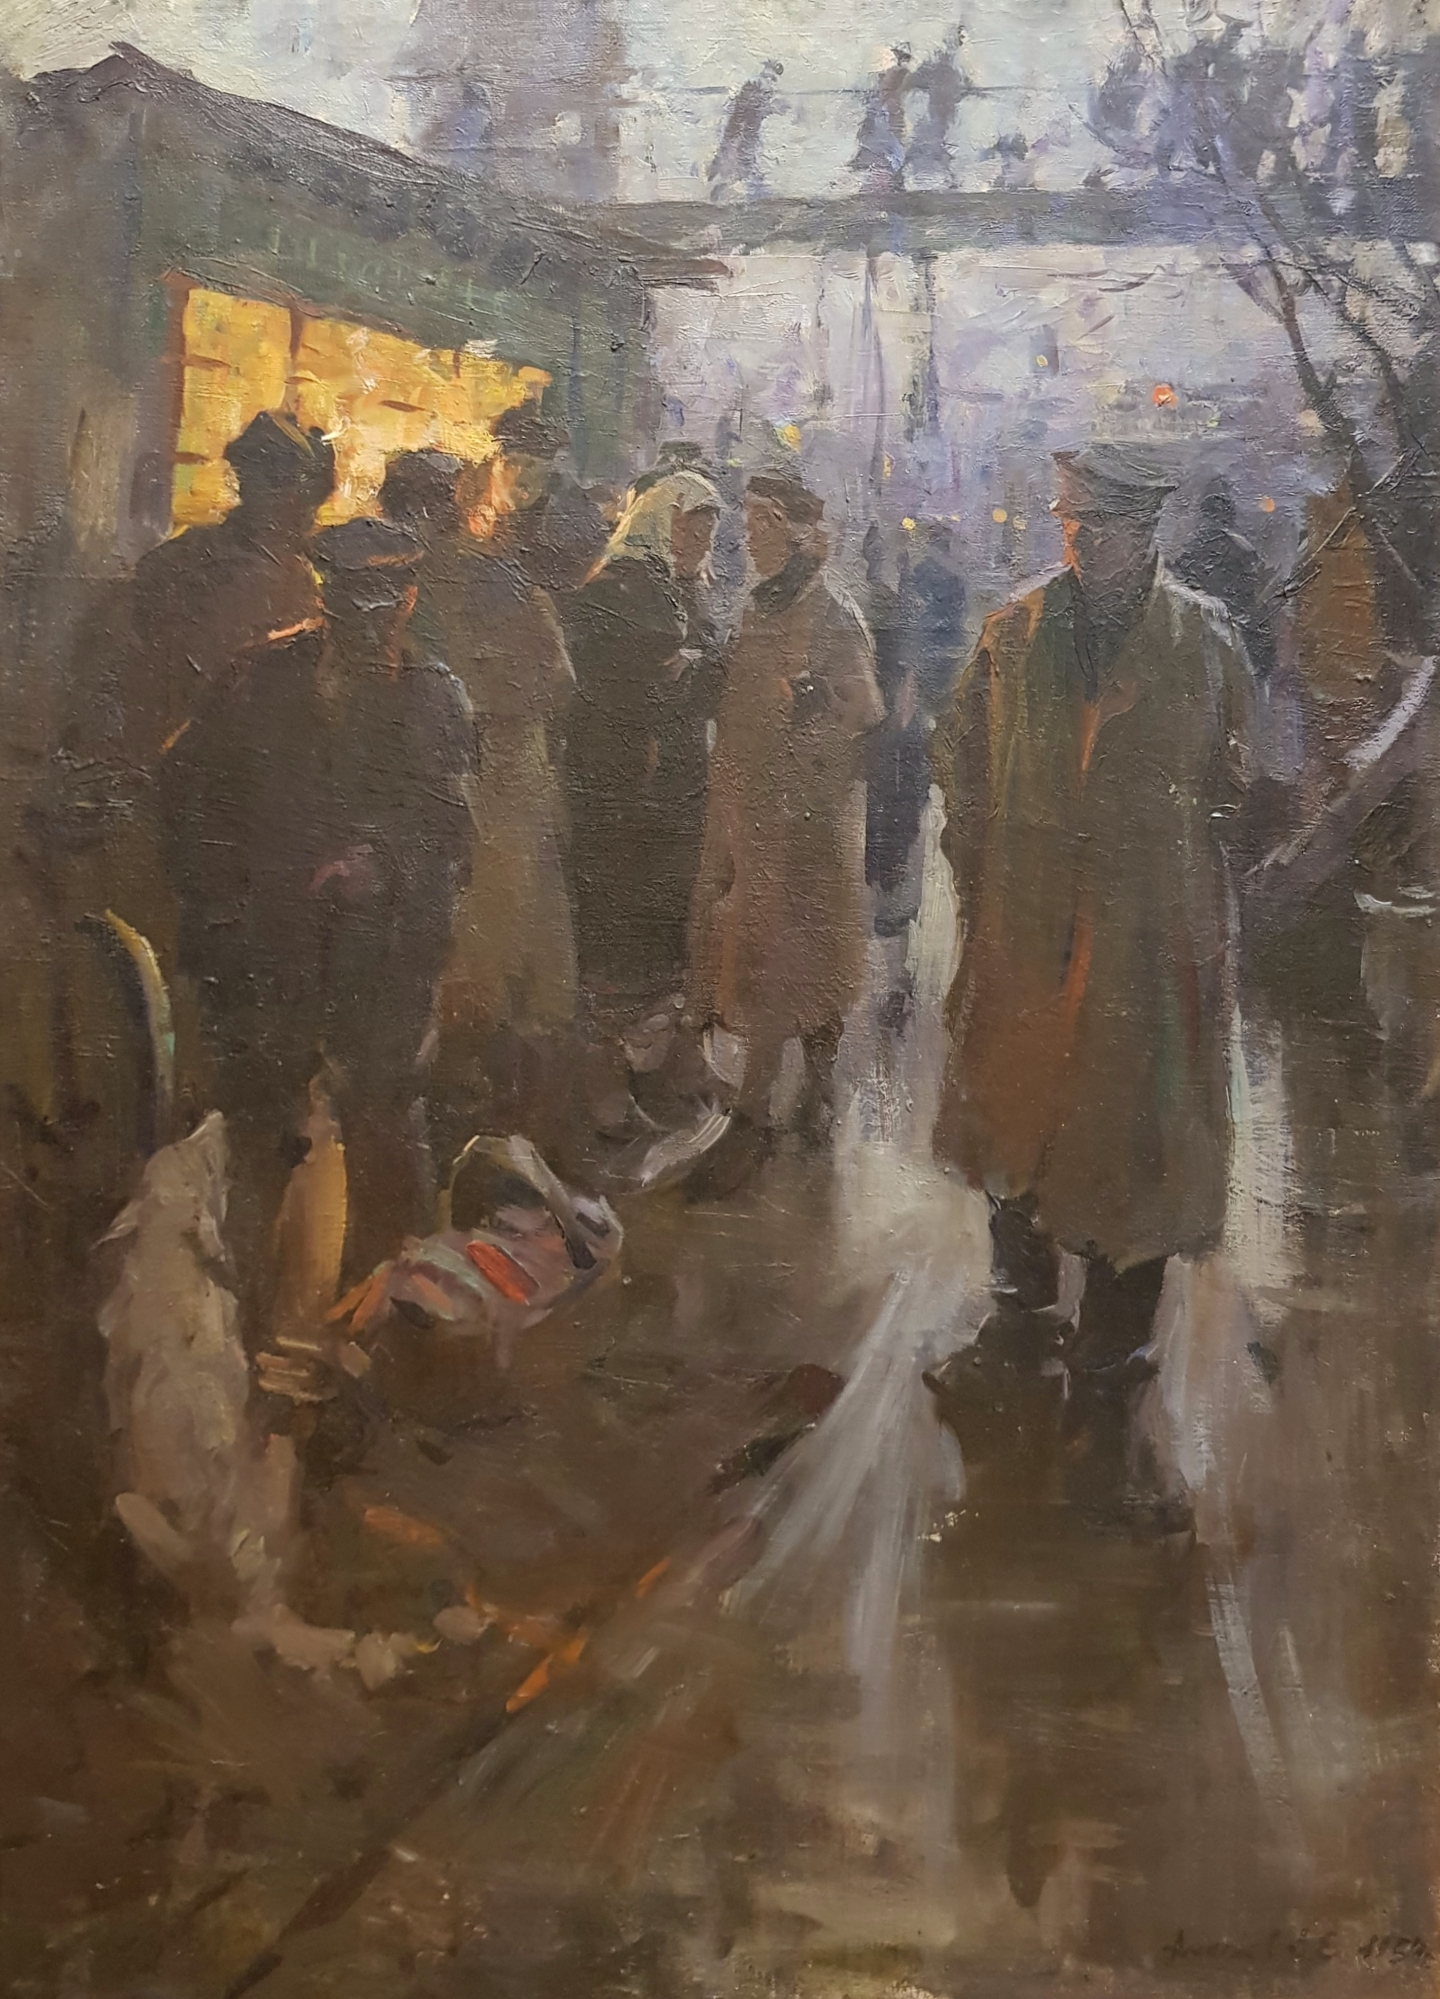 Алексеев Адольф Евгеньевич. На станции